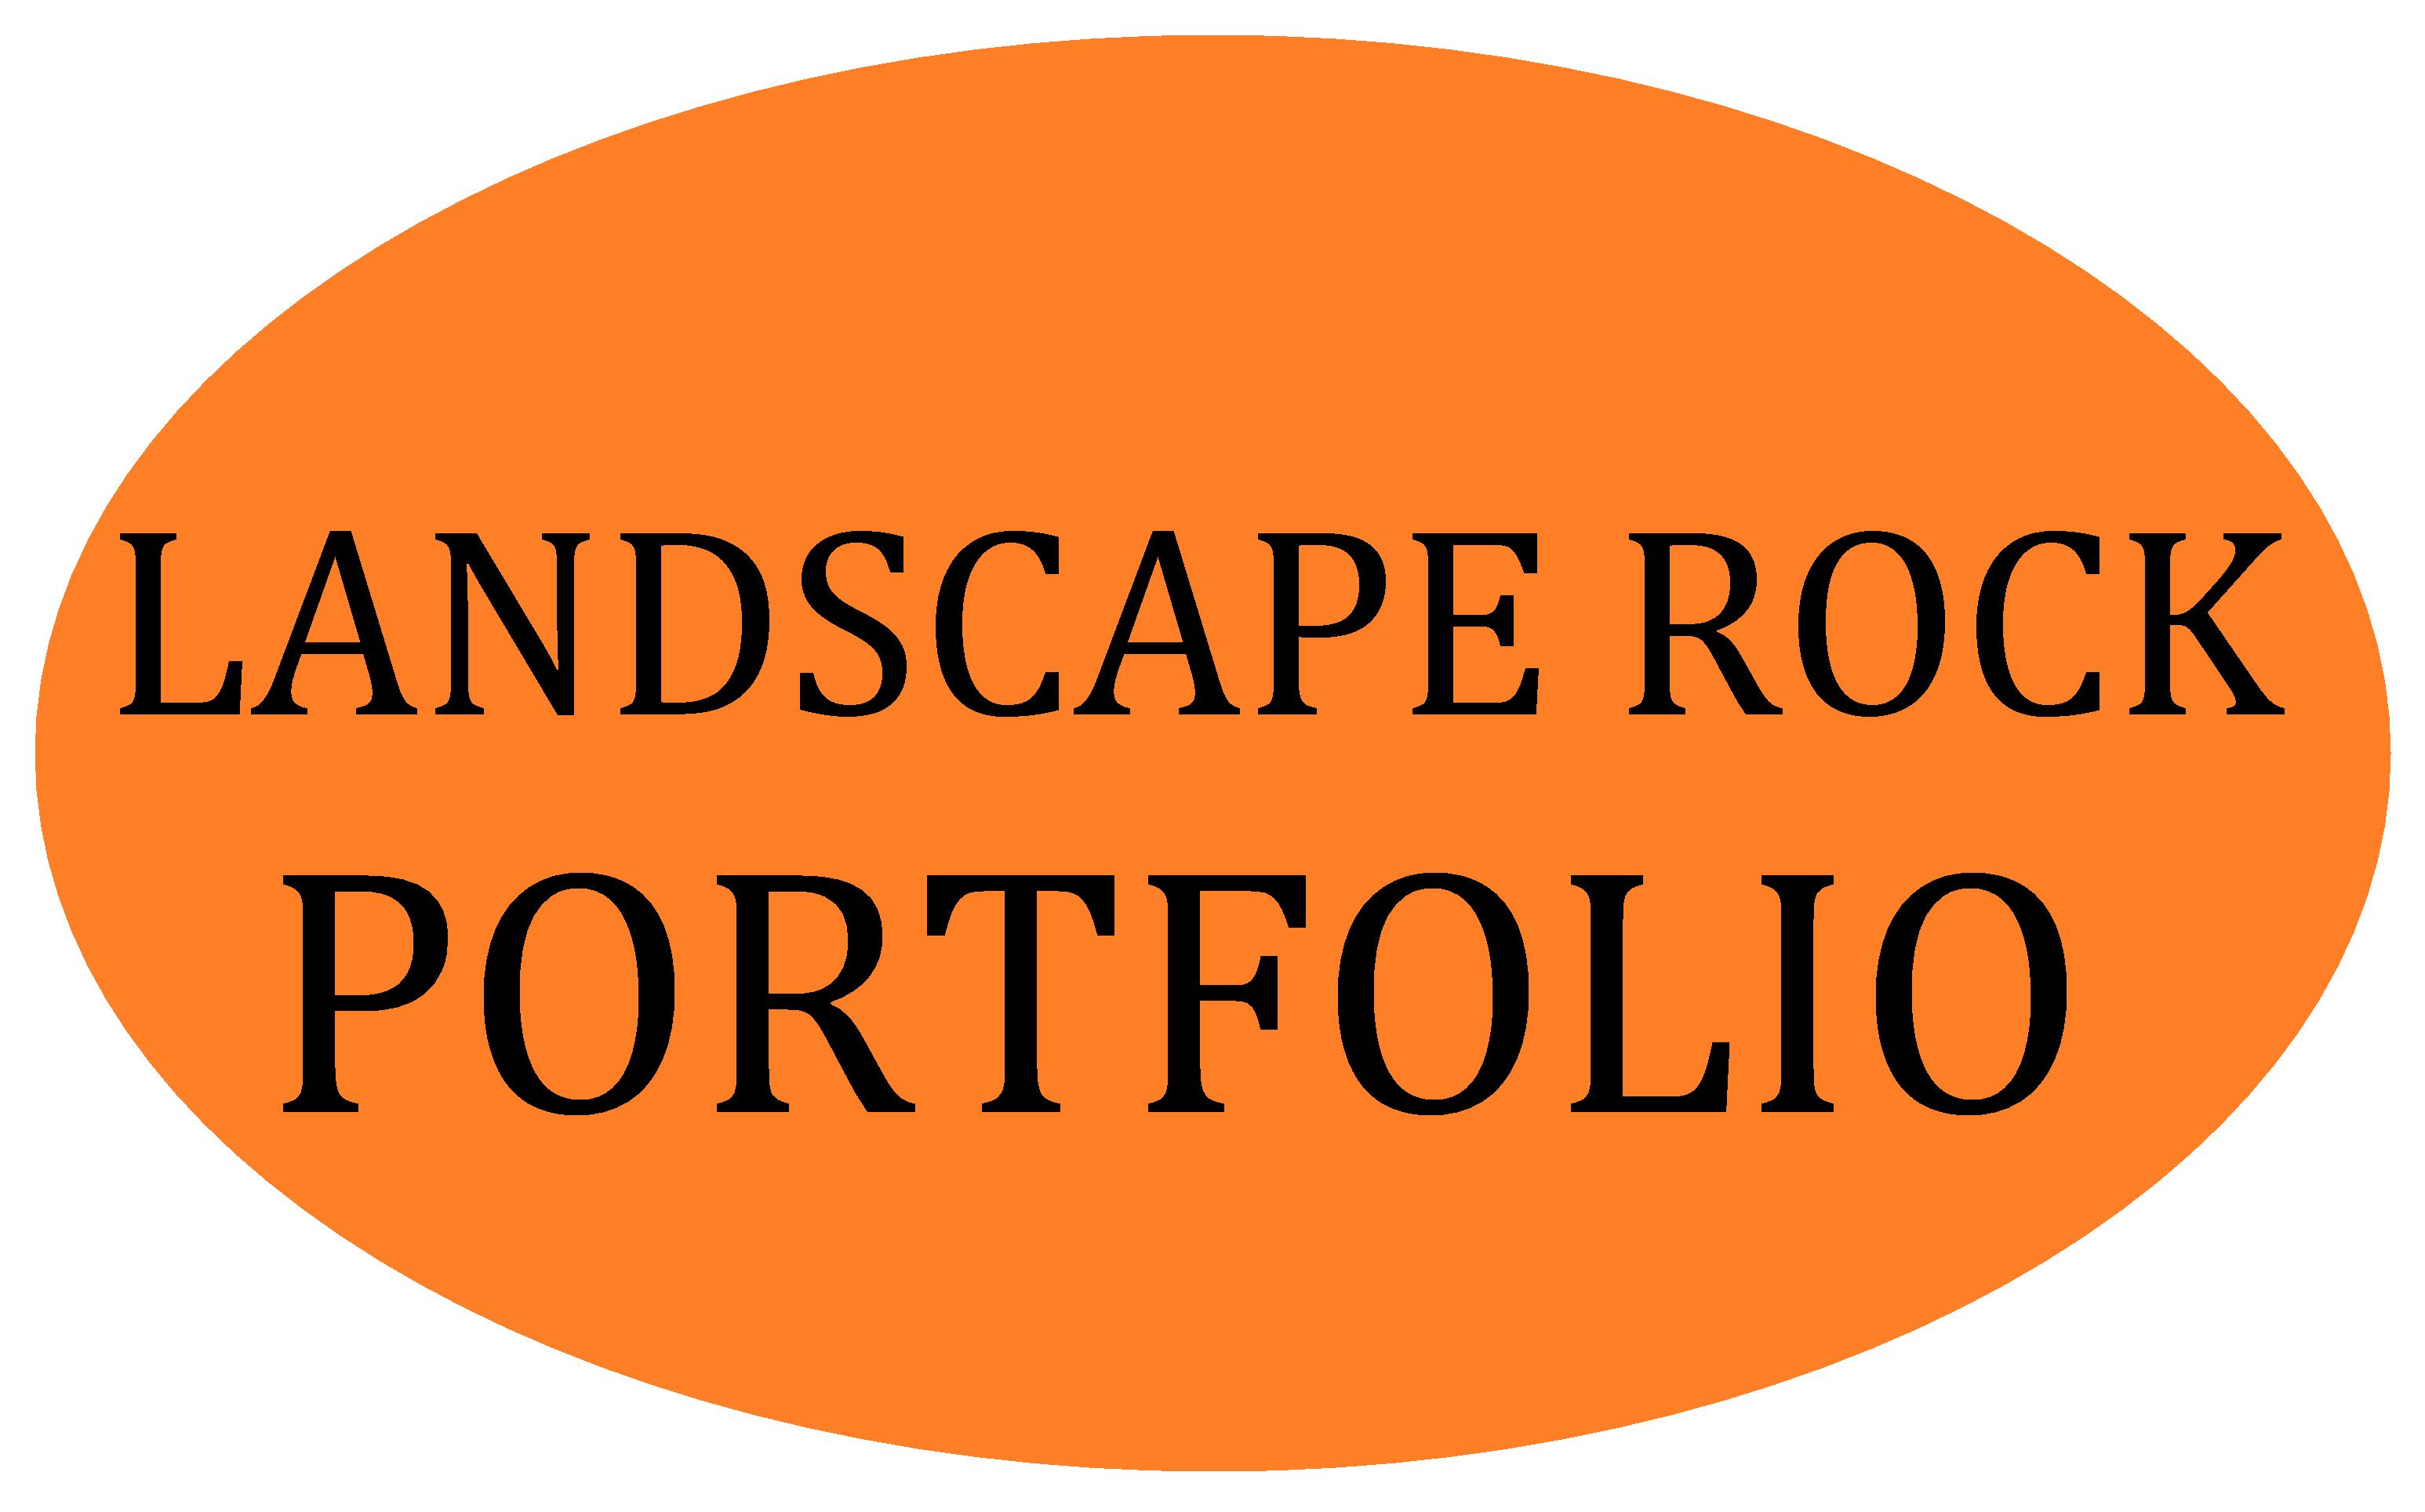 Portfolio Landscape Rock